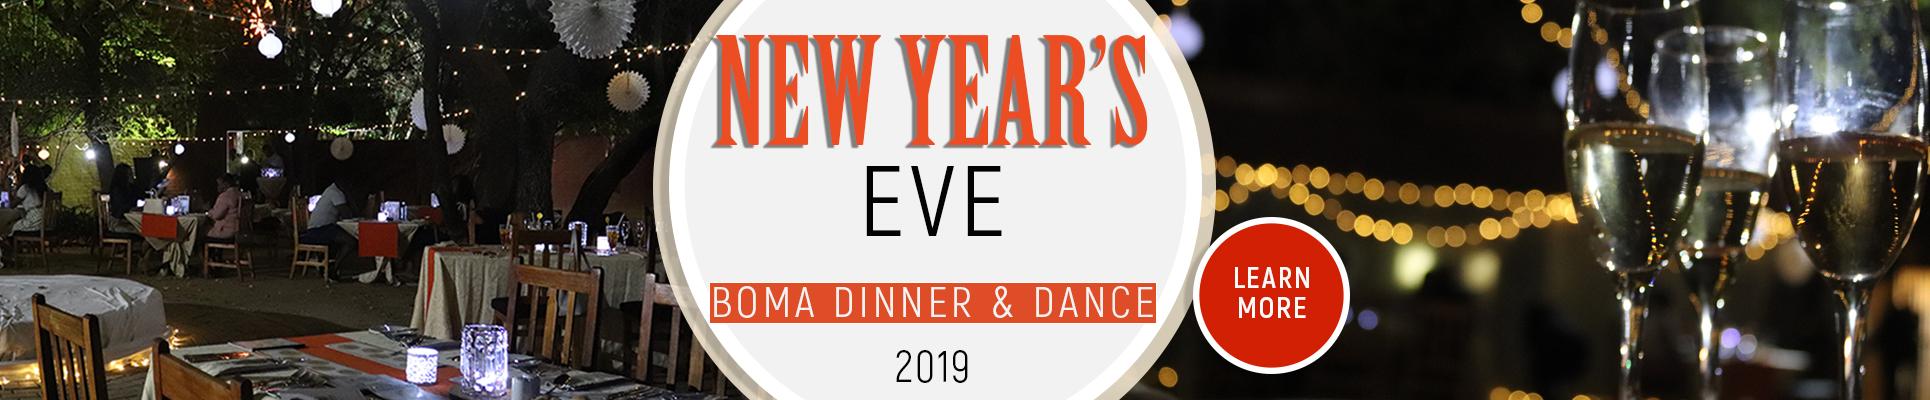 Kedar New Years Eve Boma Dinner 2019